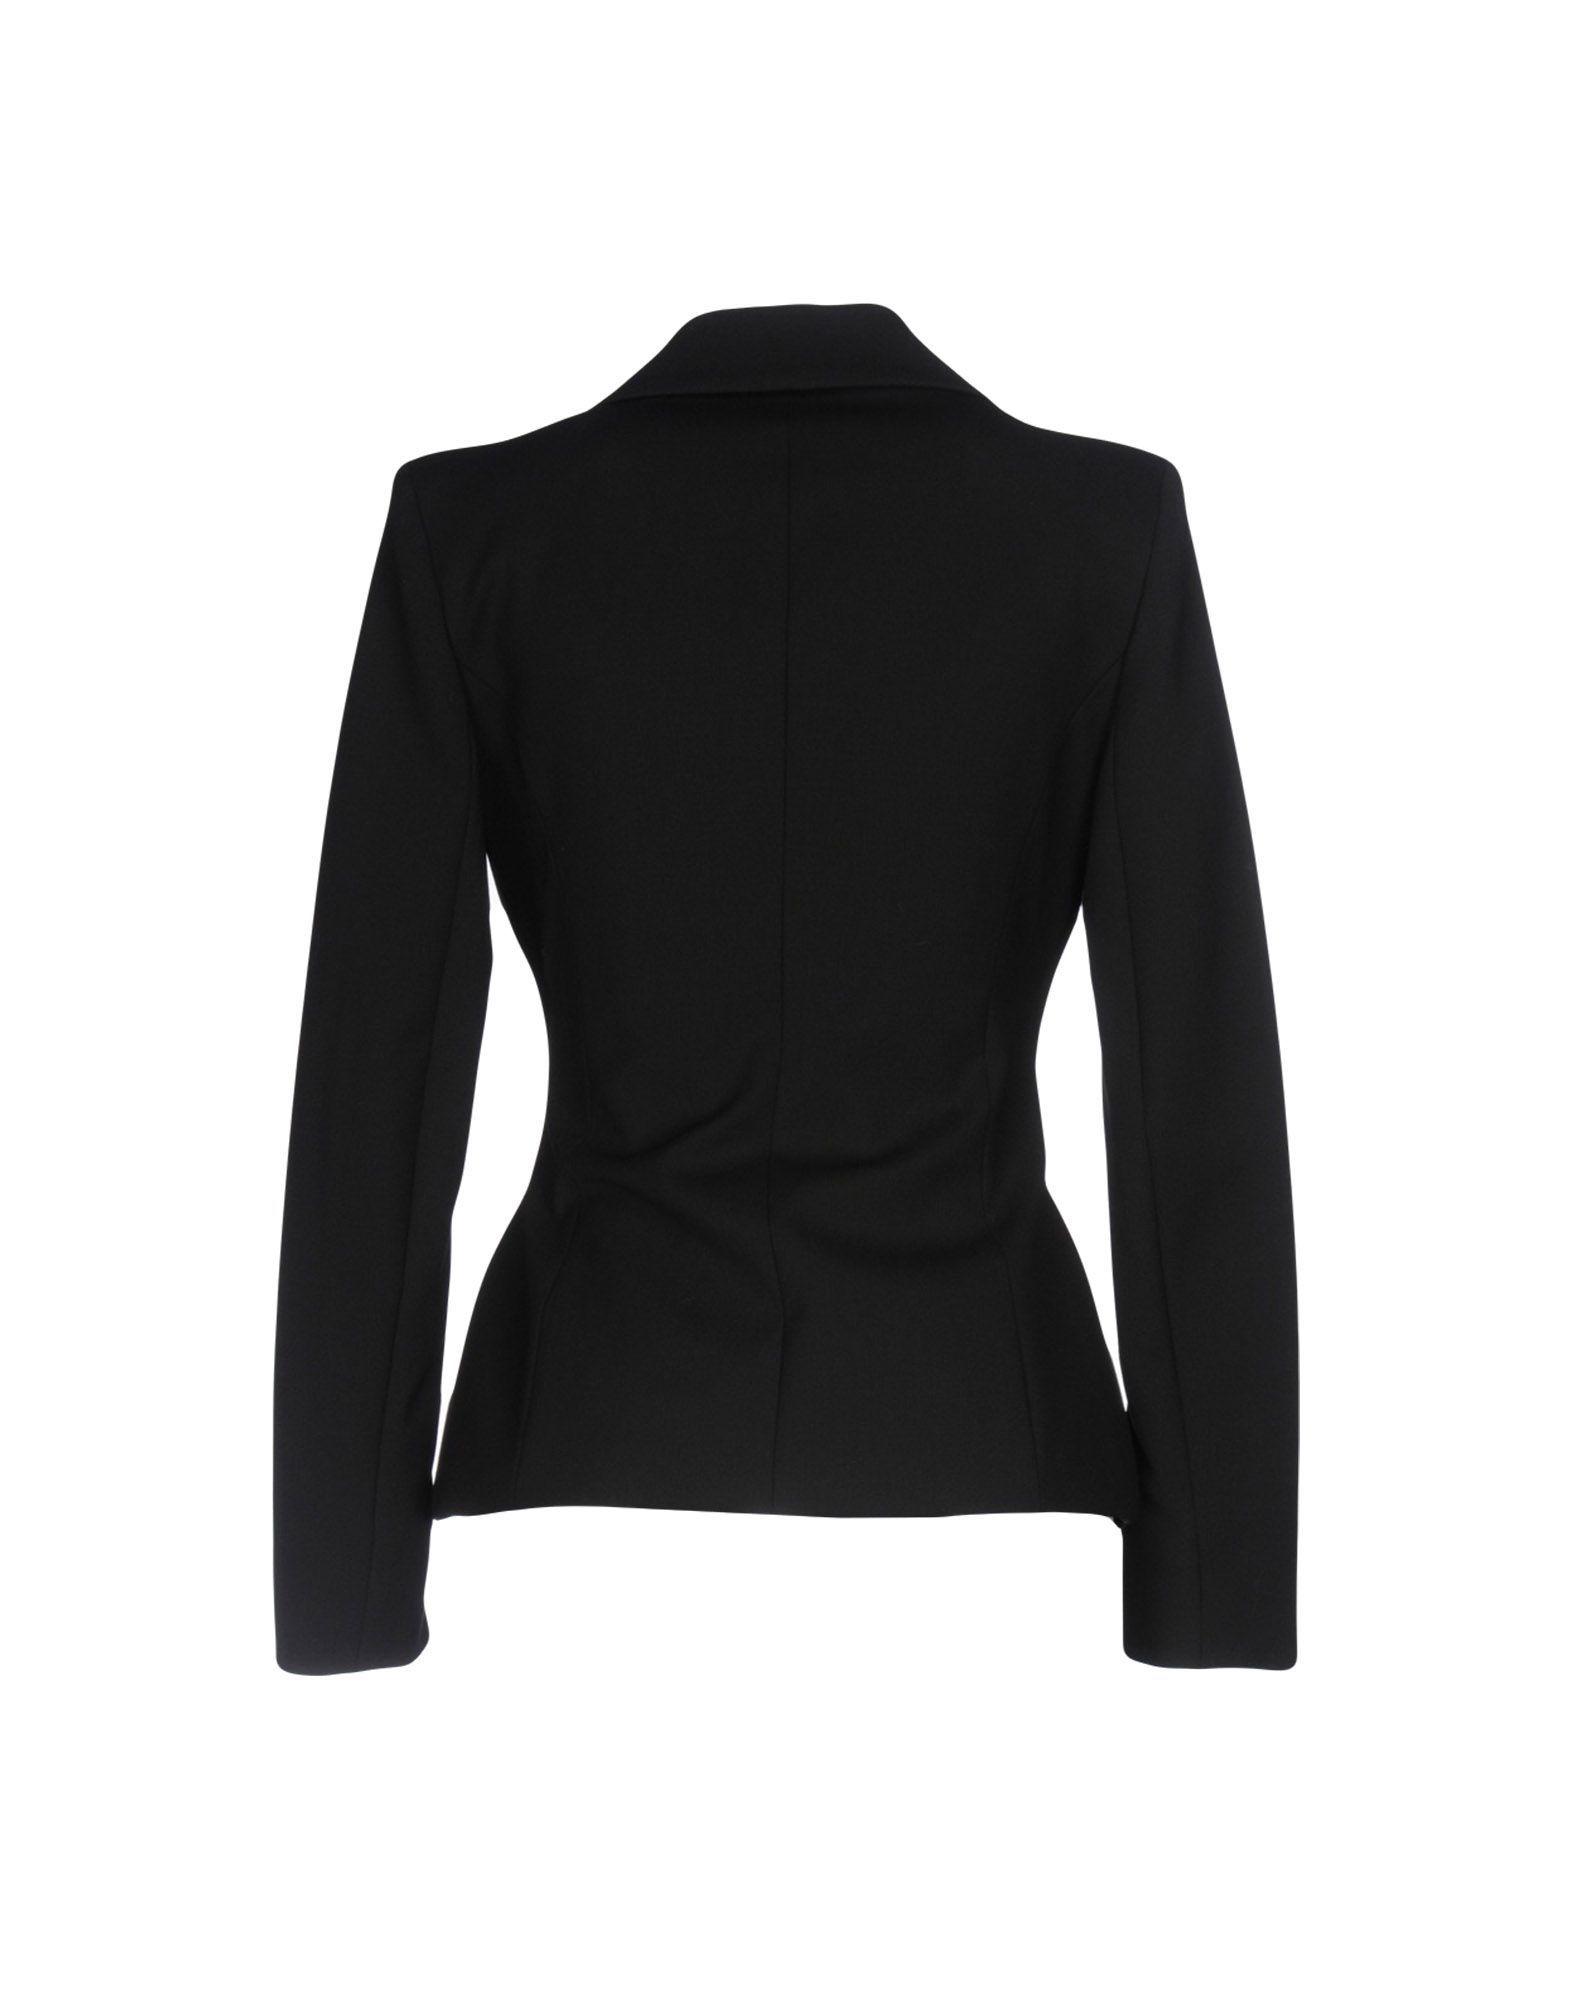 Patrizia Pepe Black Single Breasted Jacket